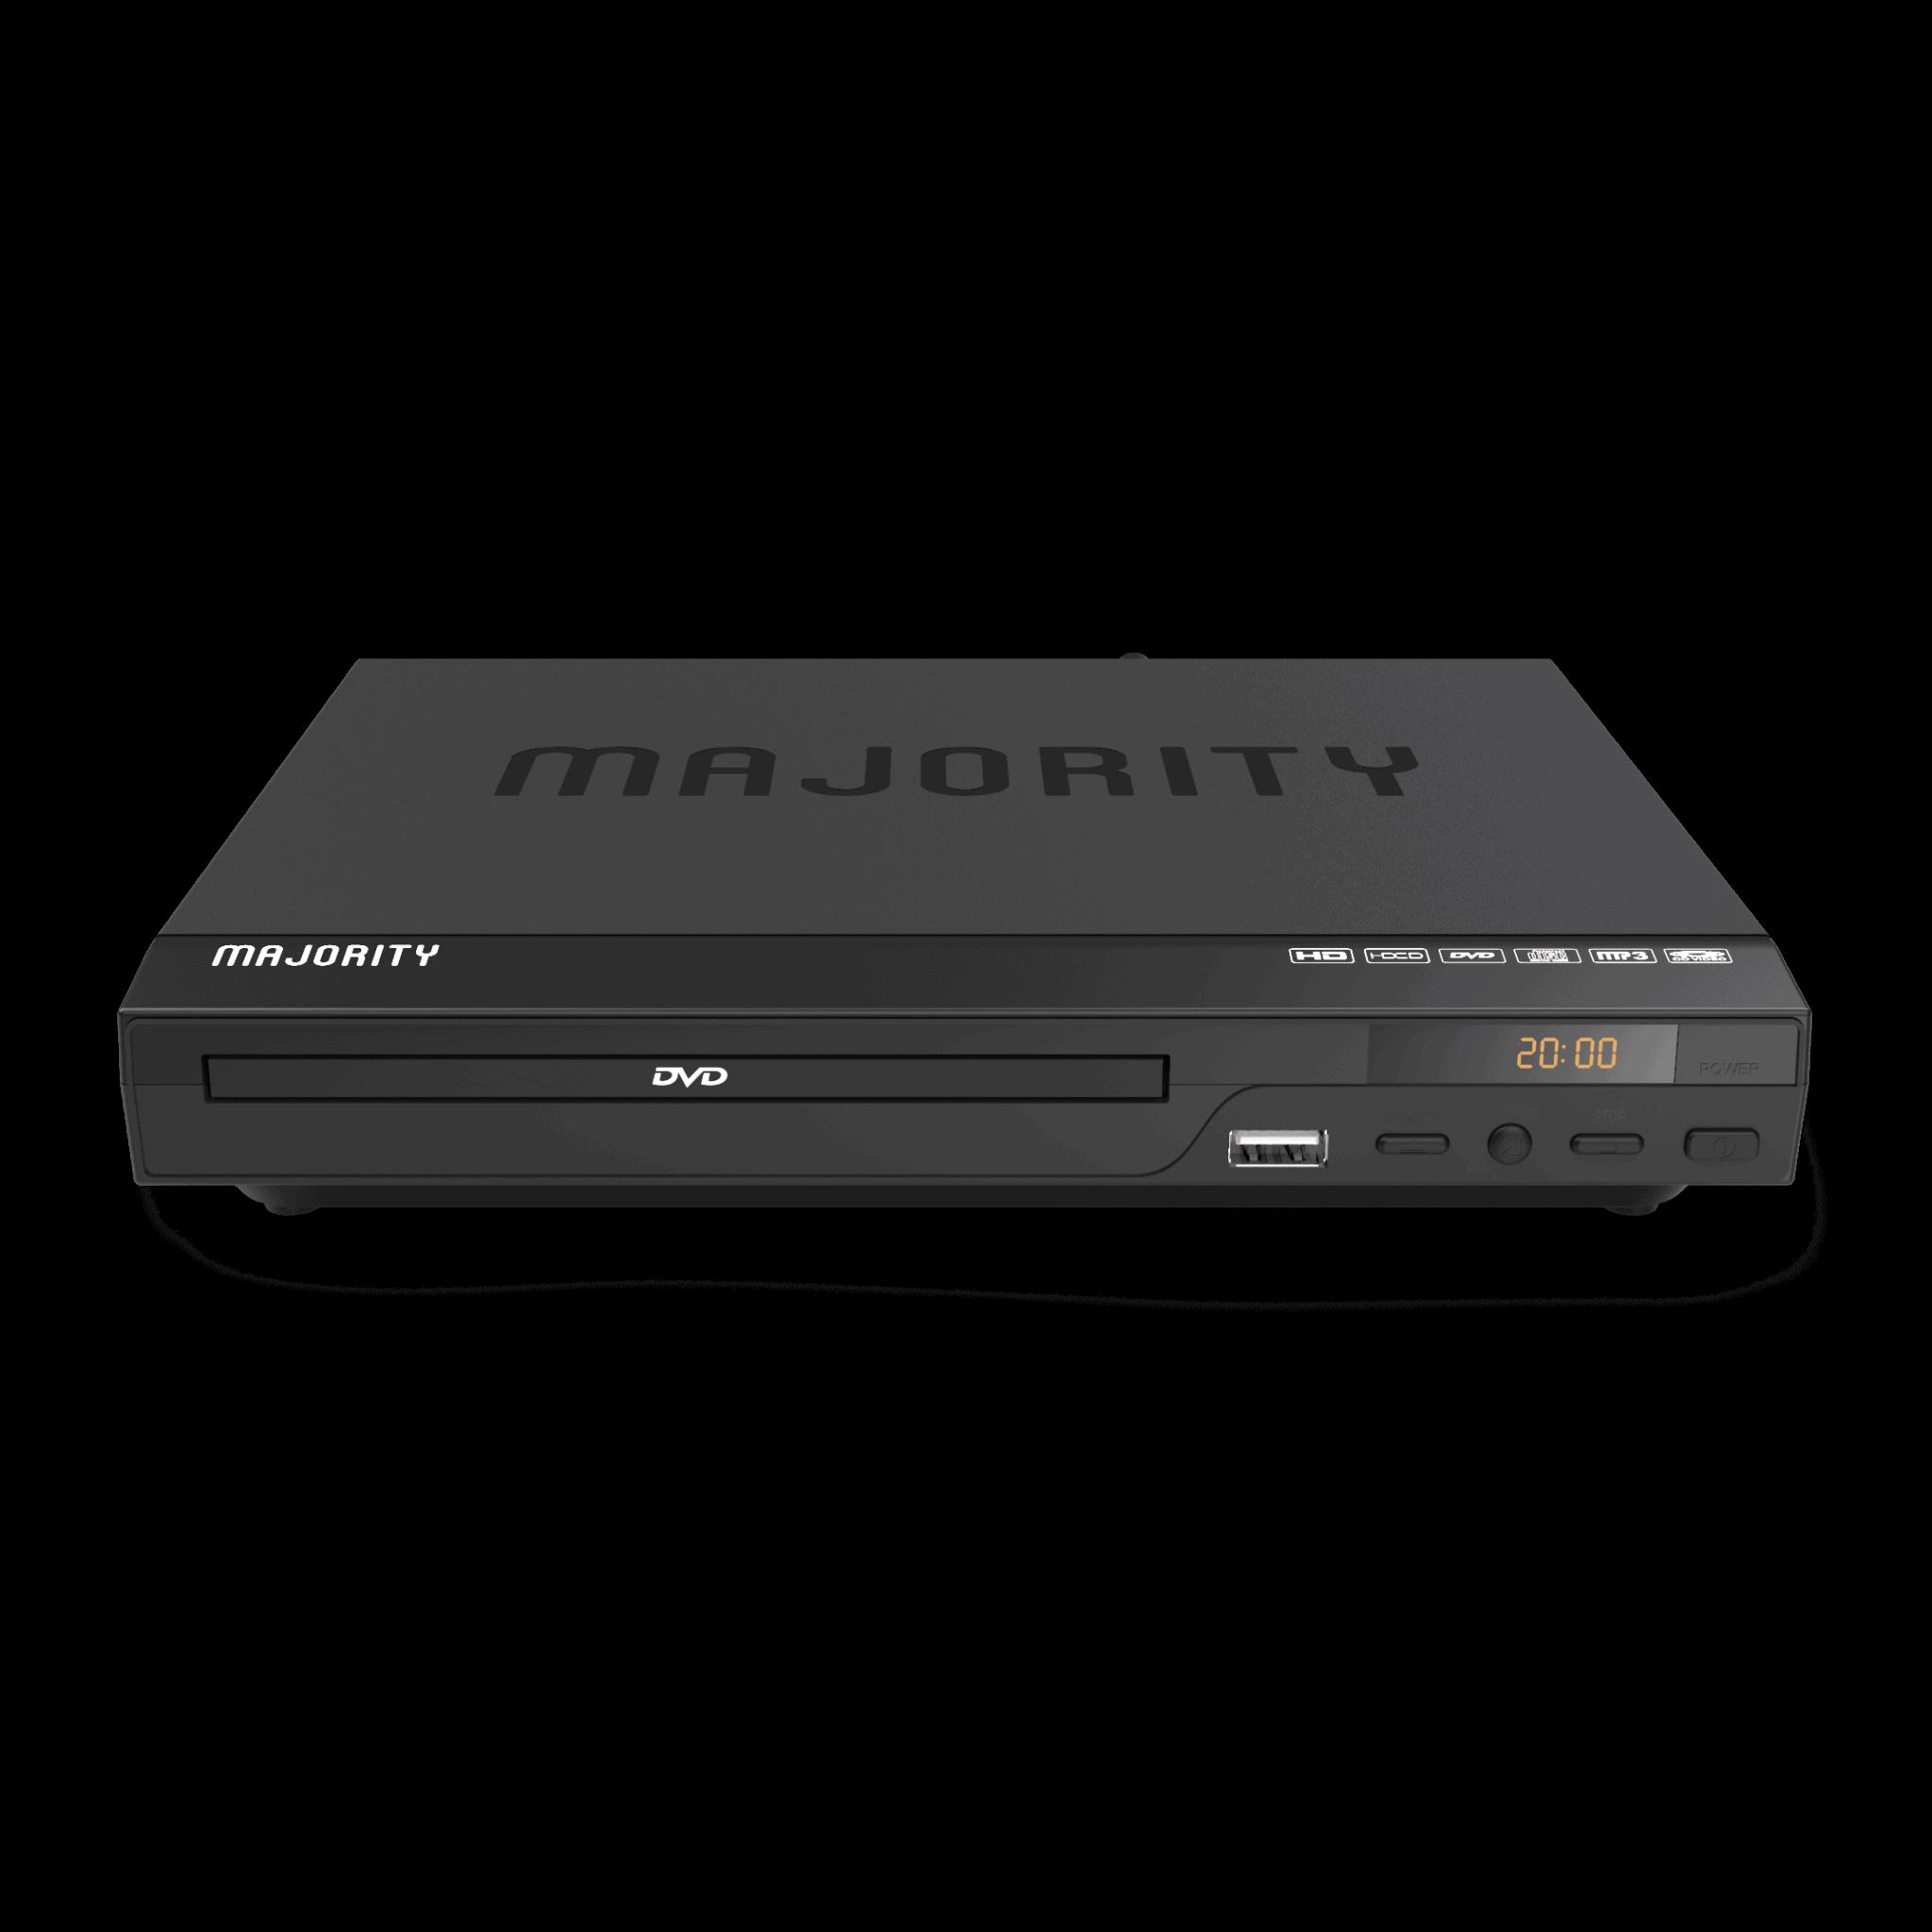 Majority DVD Player